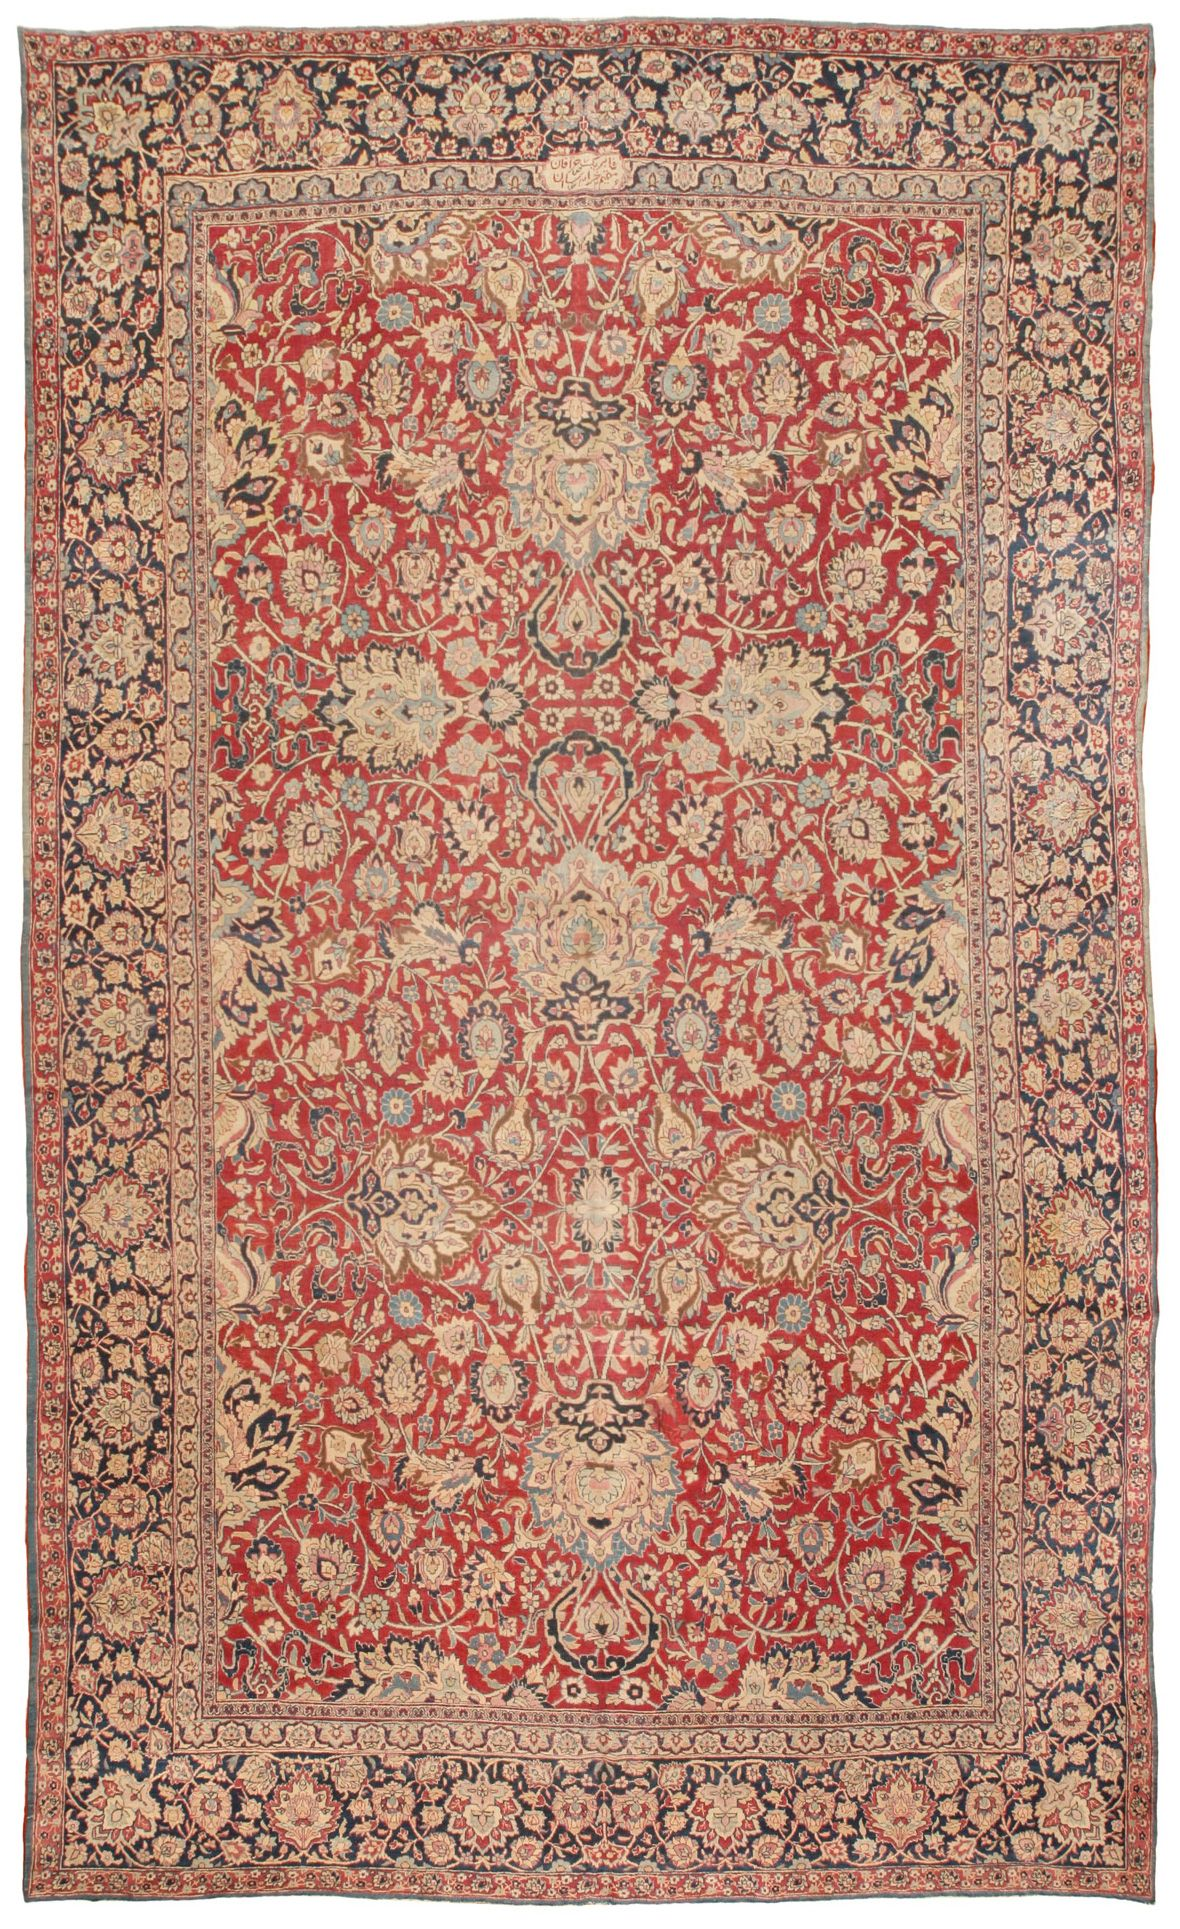 Antique Khorossan Carpet 10.6 X 17.0 - Fred Moheban Gallery